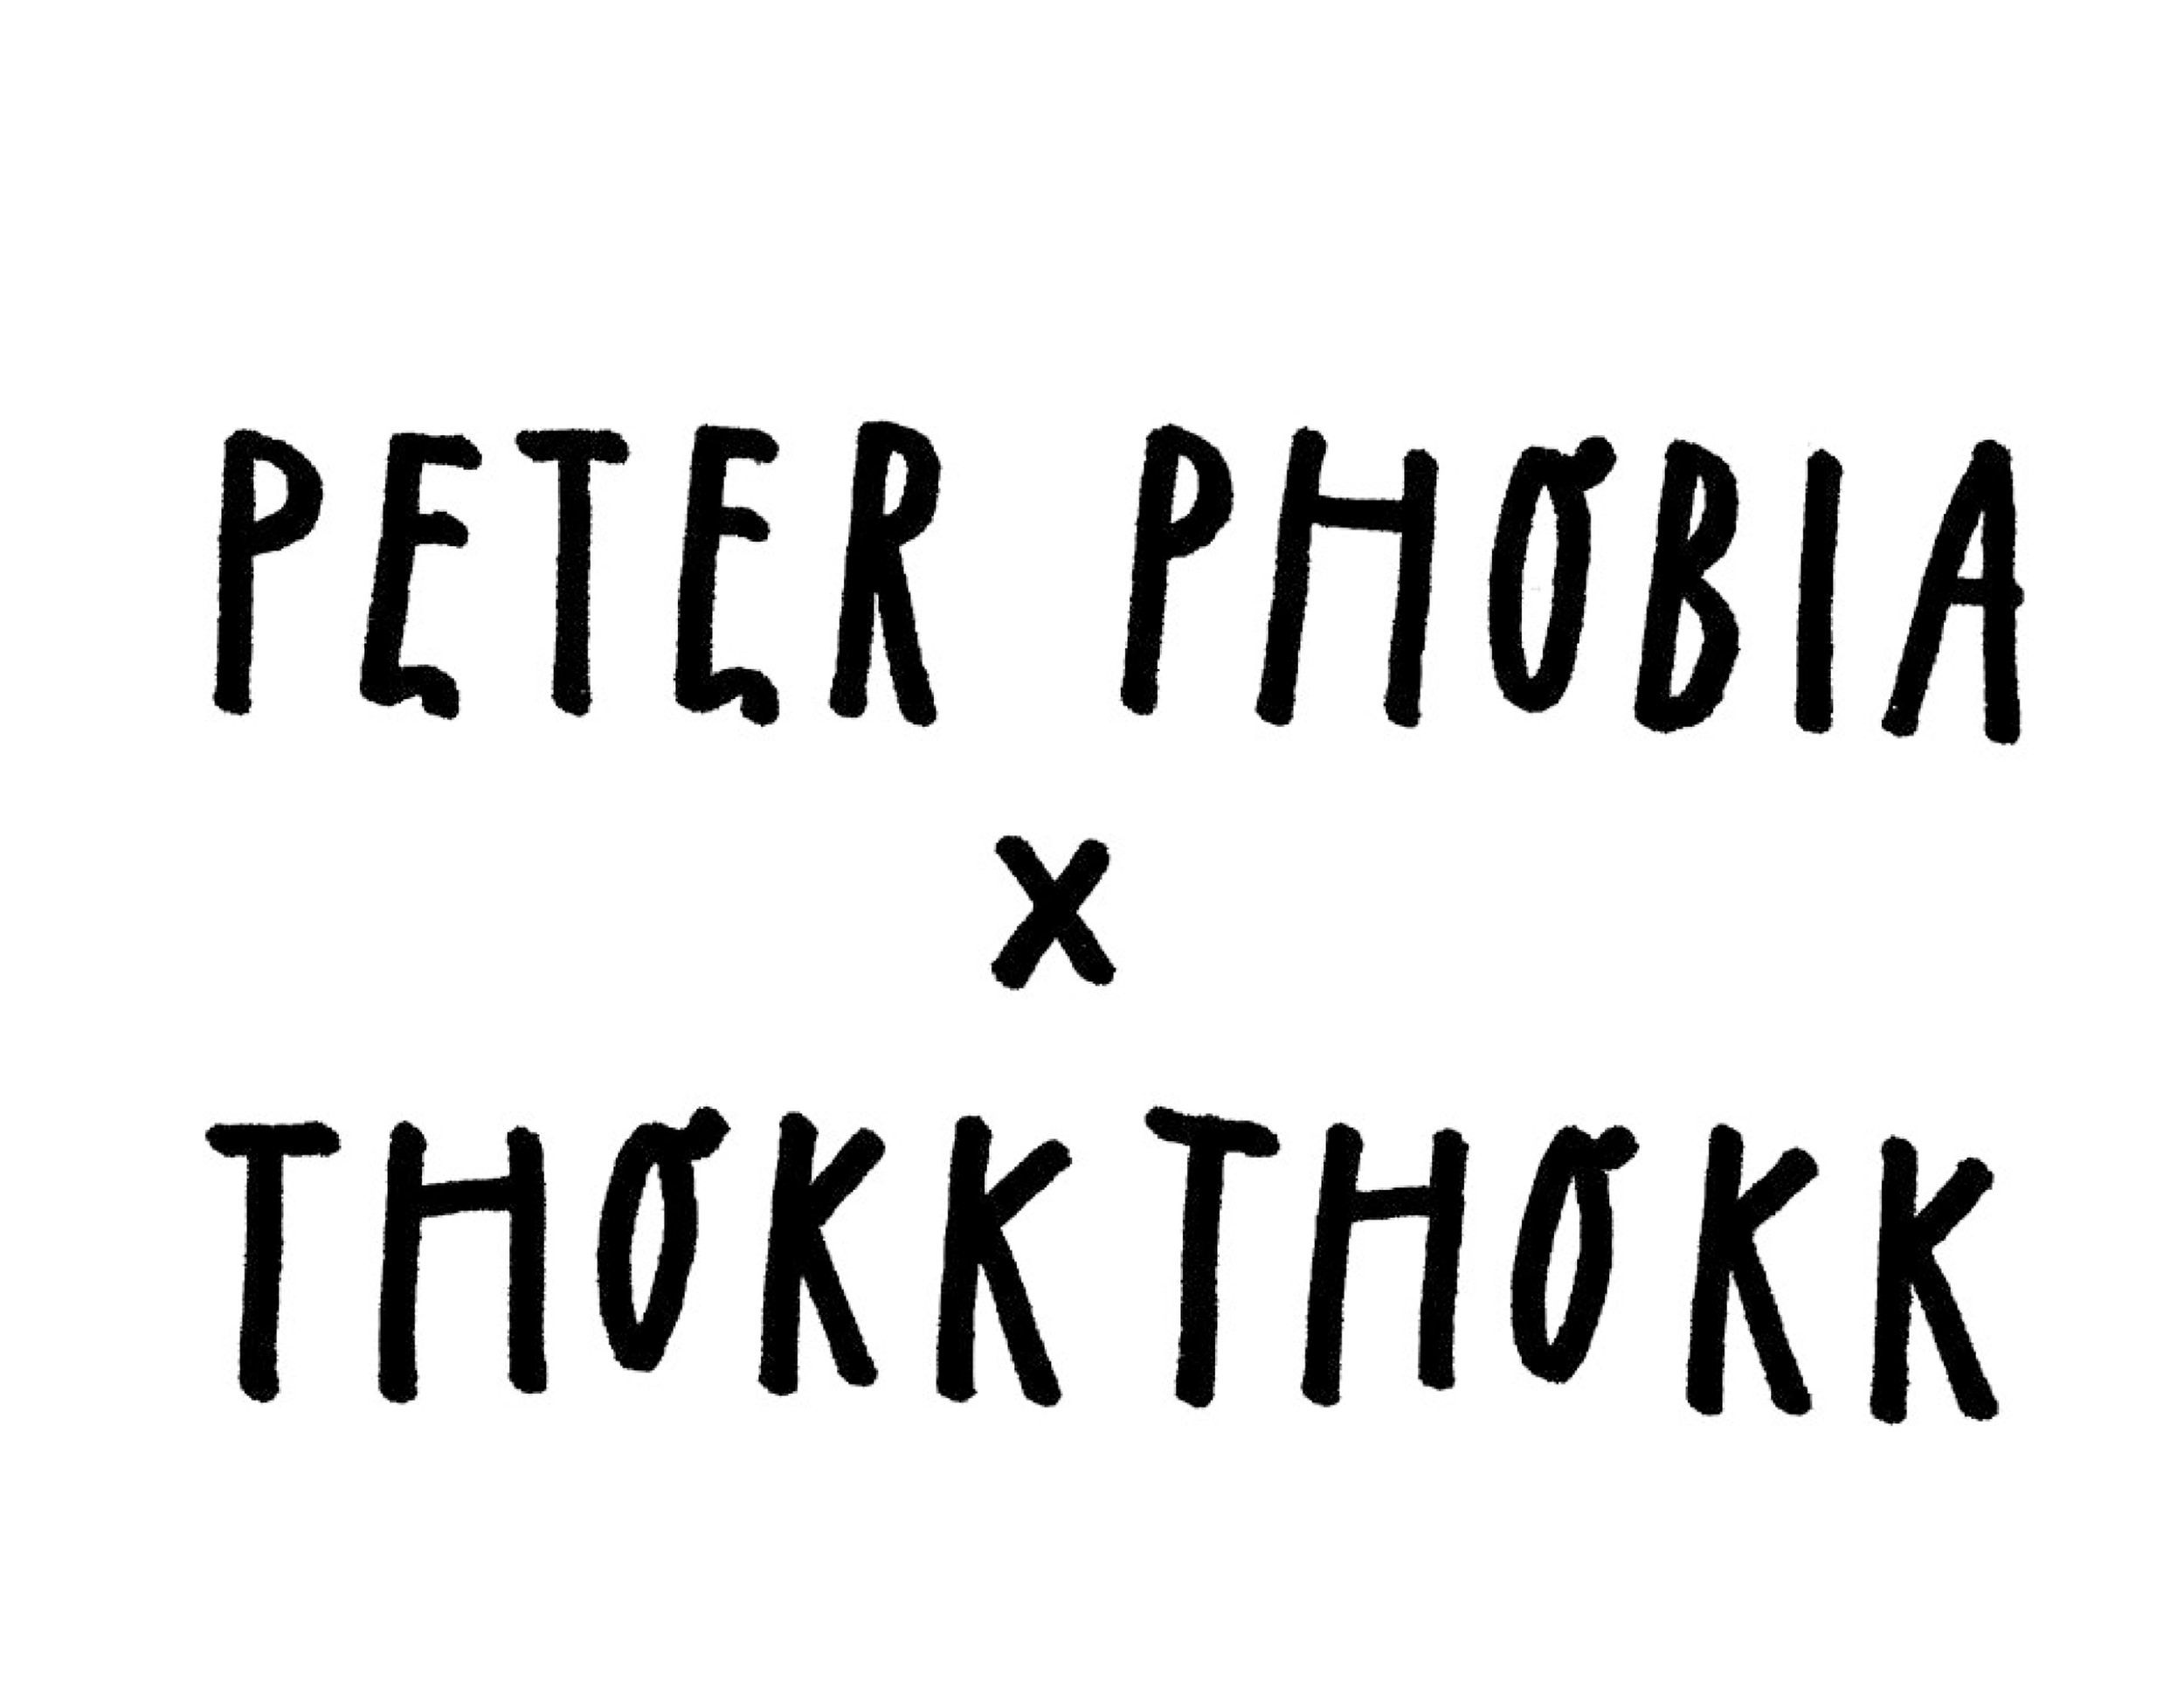 Preview_ThokkThokk_PeterPhobia_2017-1.jpg